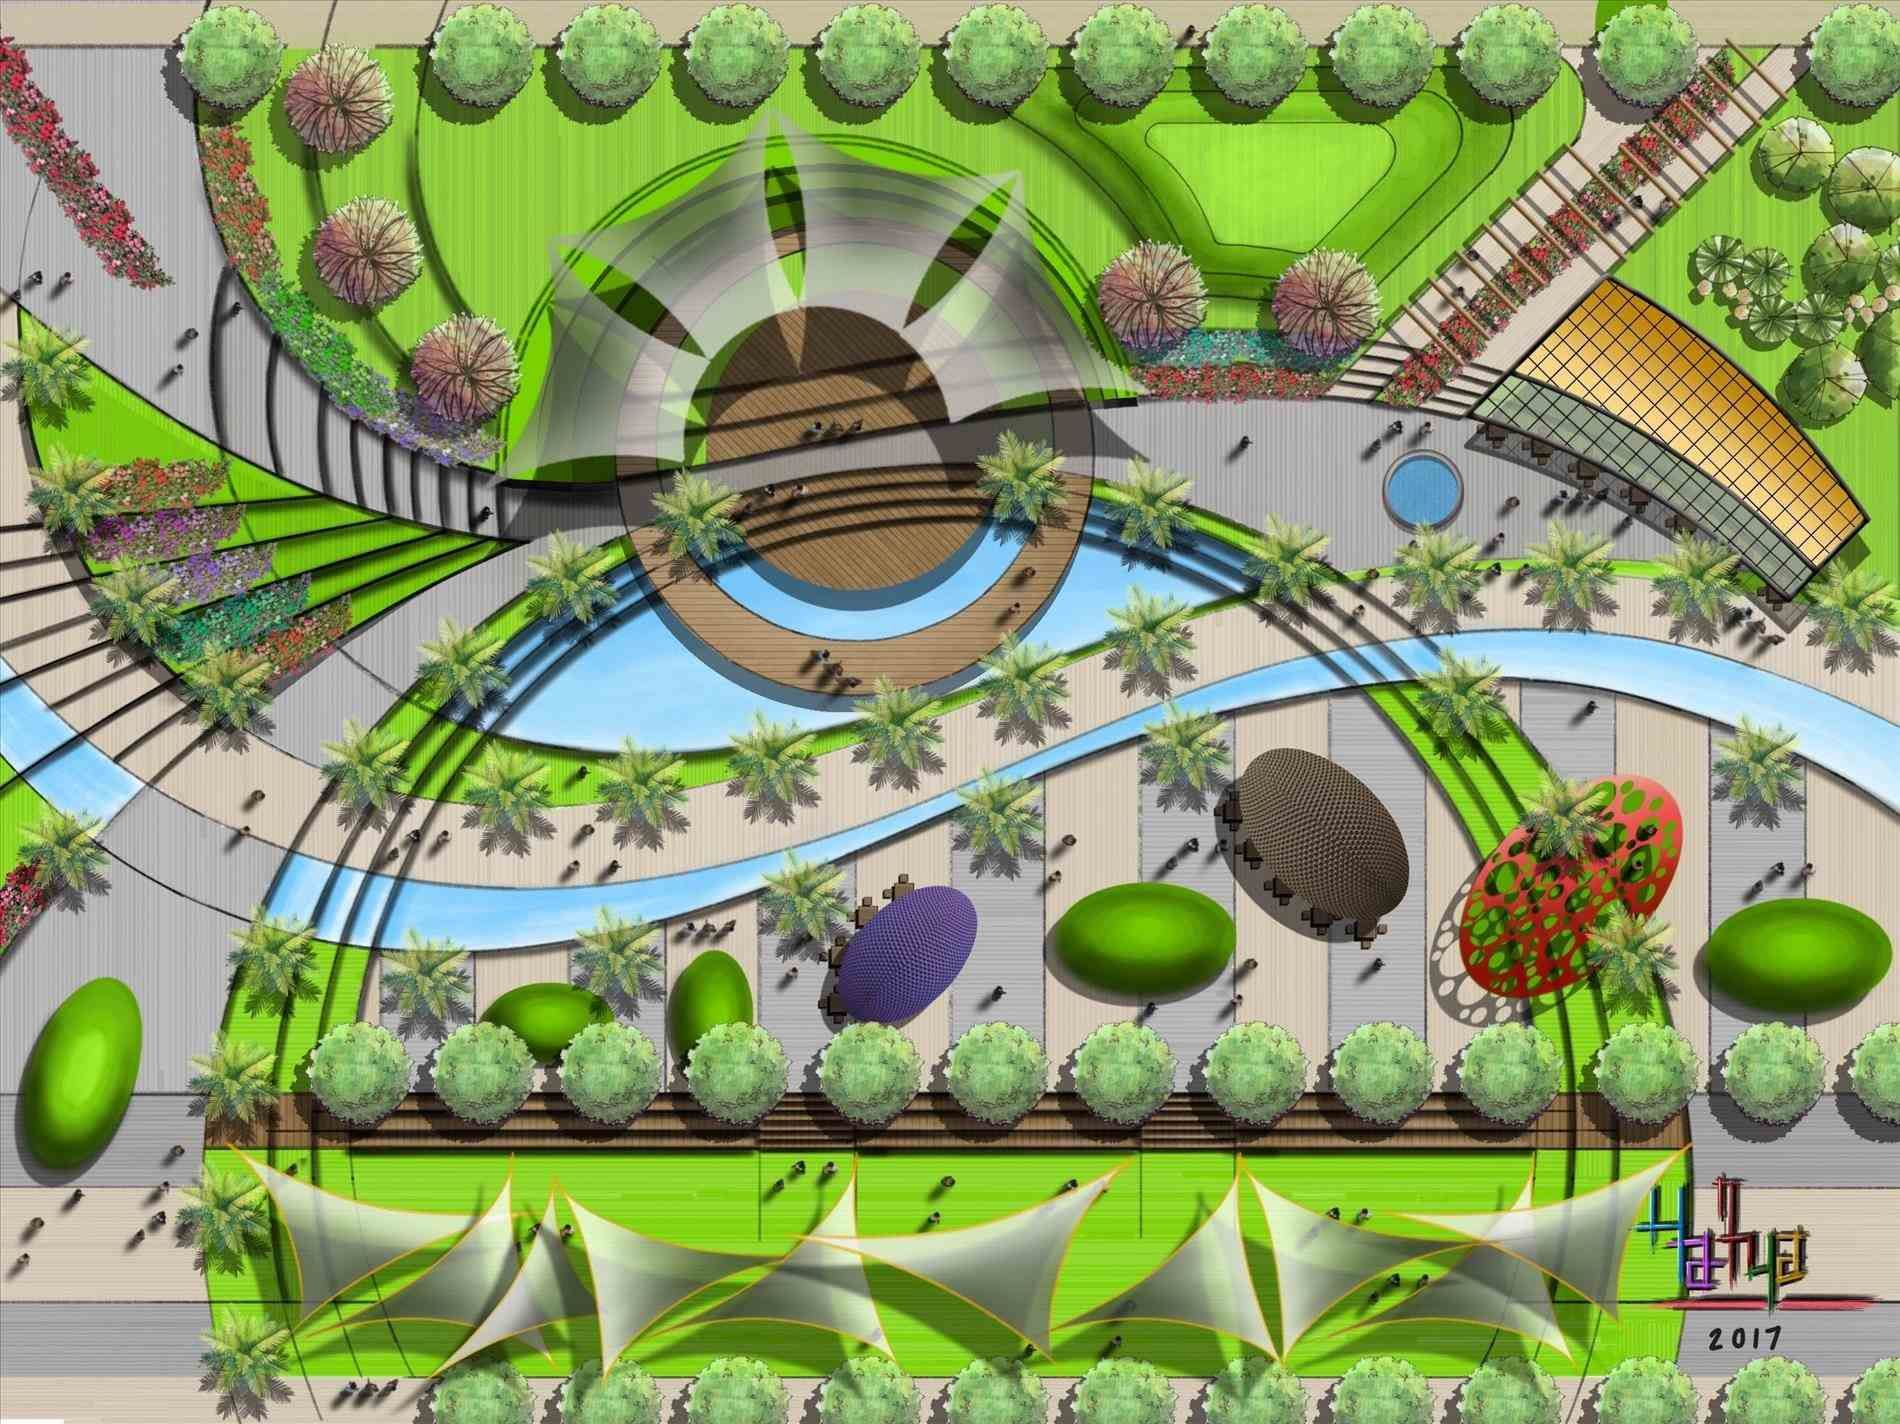 Park Landscape Design Ideas Peyzaj Mimarisi Tasarimlari Peyzaj Mimarisi Peyzaj Tasarimi